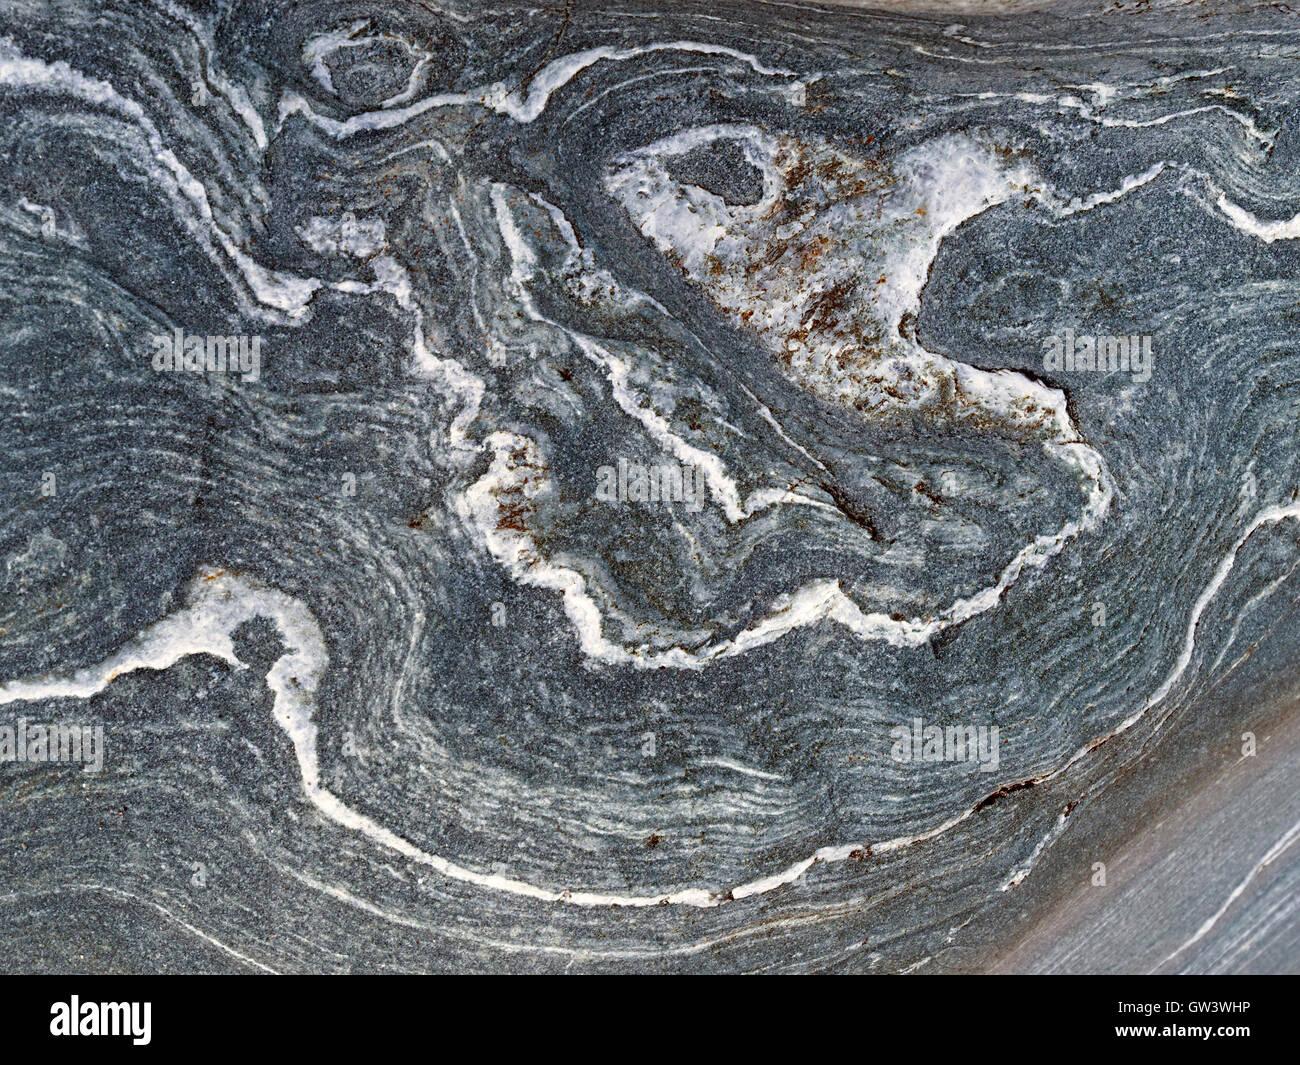 Swirls and folds of white quartz or marble veins in grey rock strata, Uragaig, Isle of Colonsay, Scotland, UK. - Stock Image